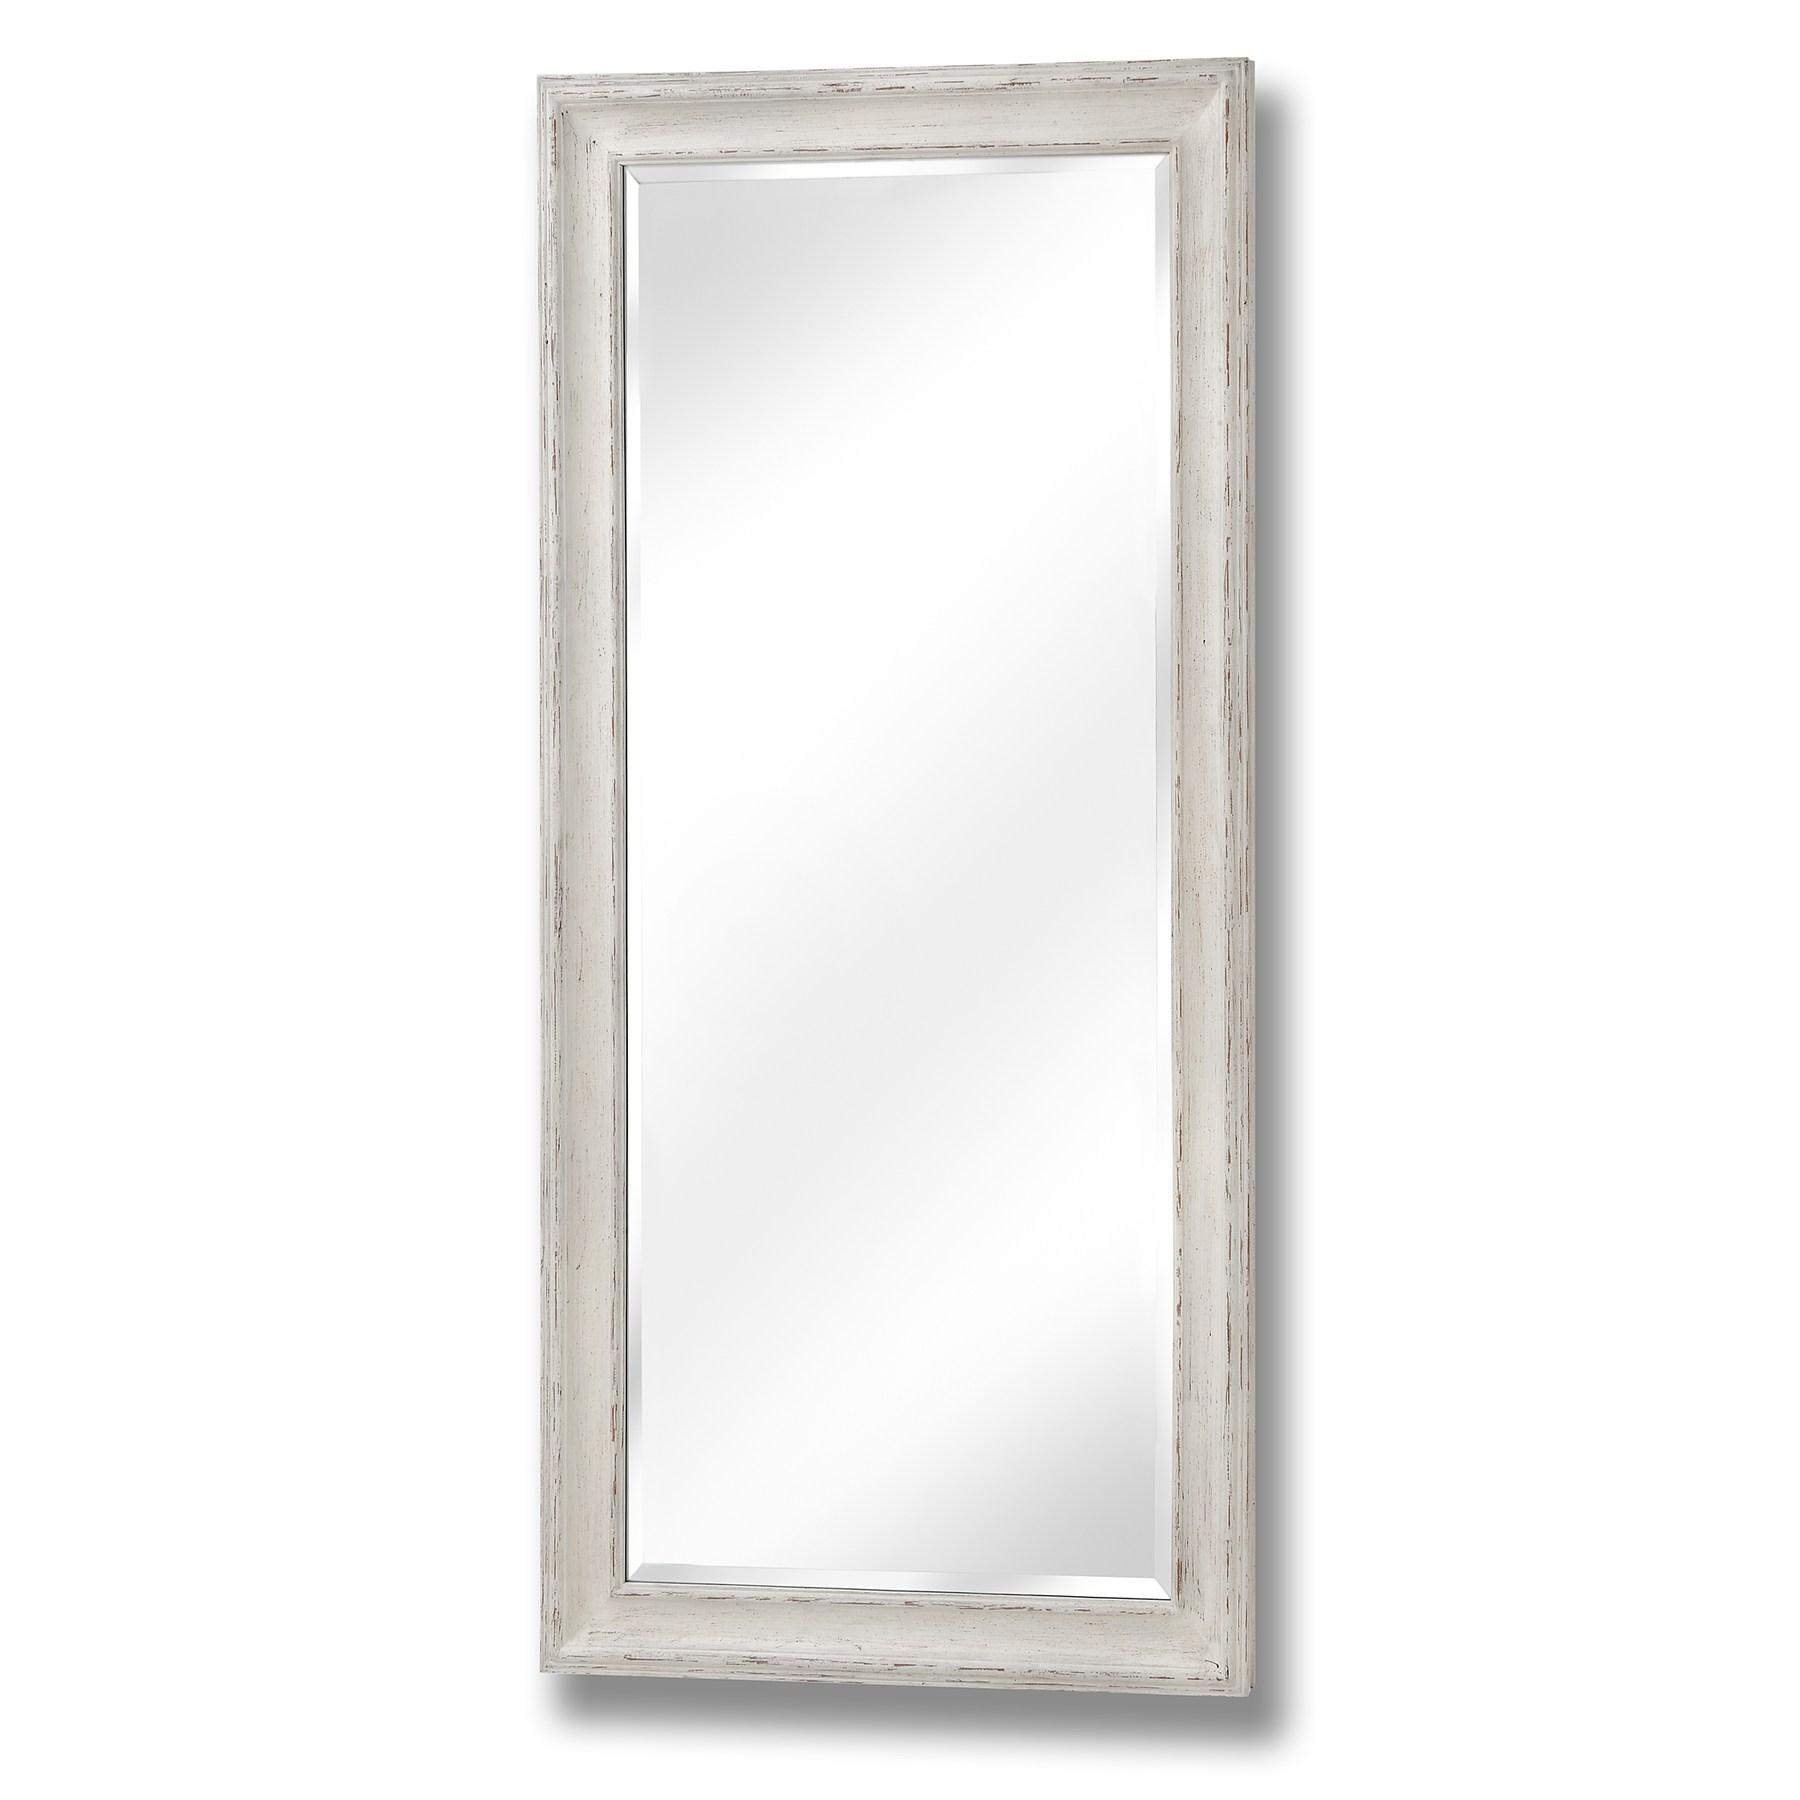 Antique White Large Frame Mirror